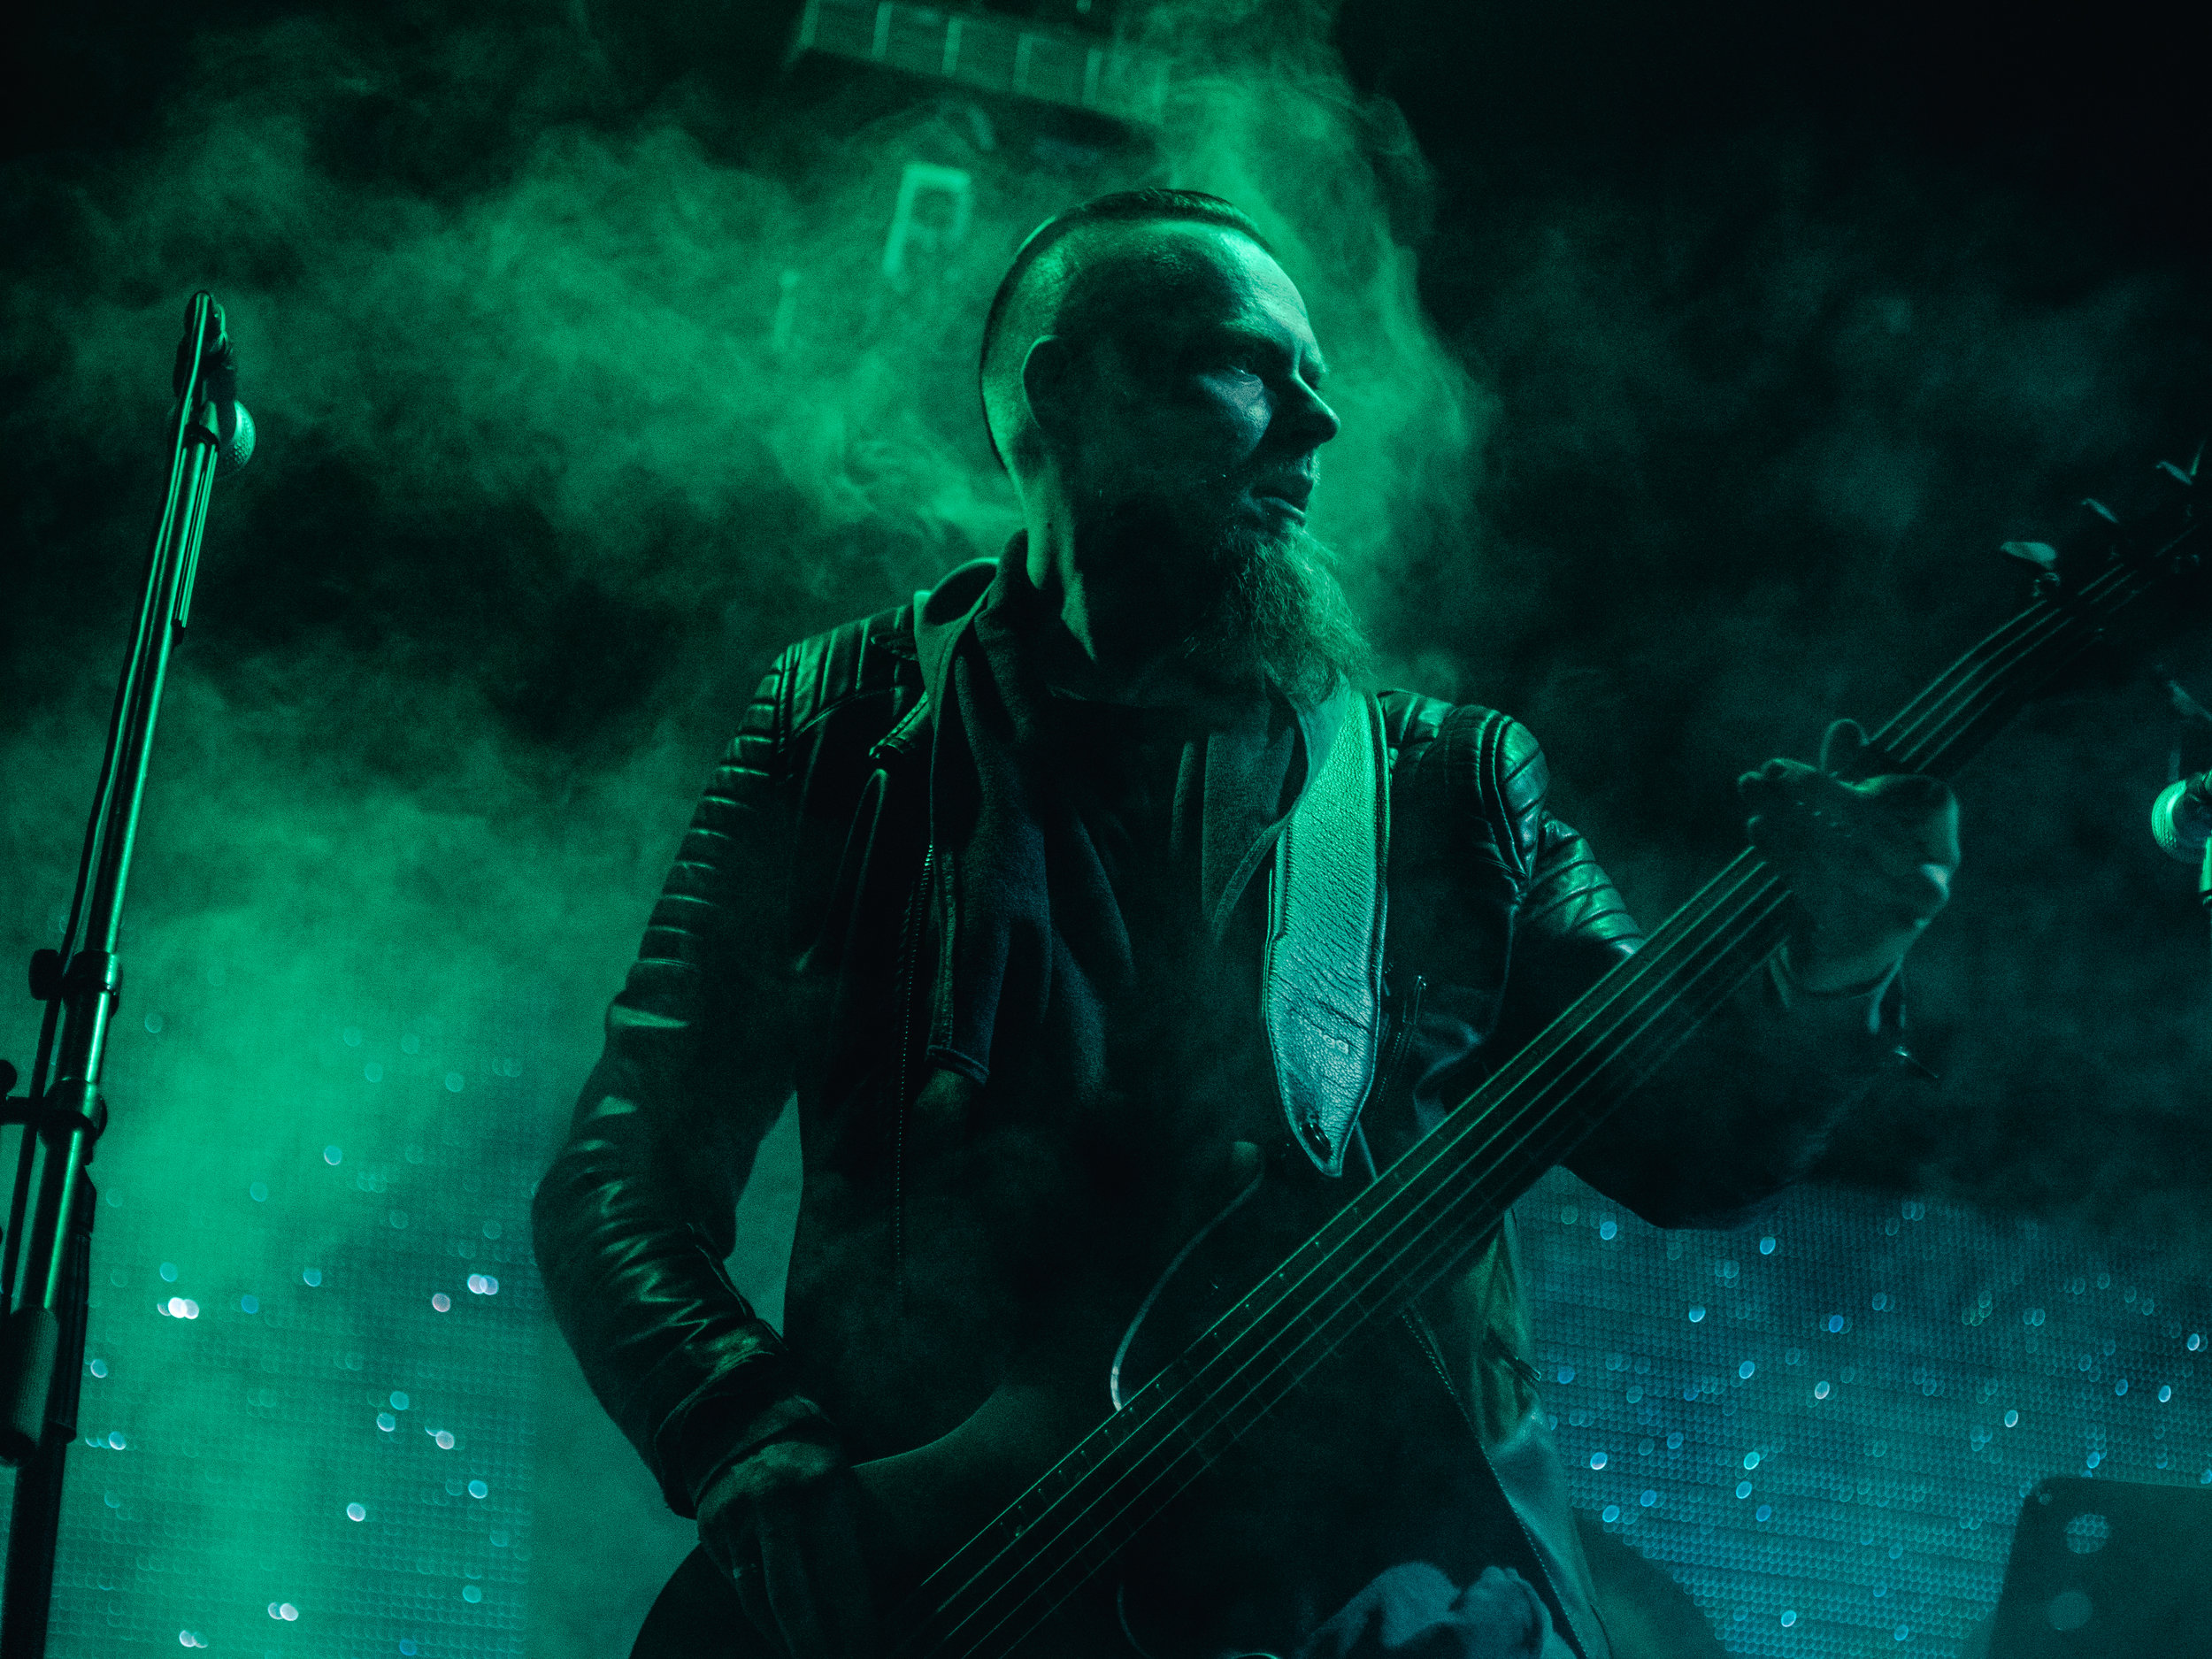 Andris Geiba — bass guitar